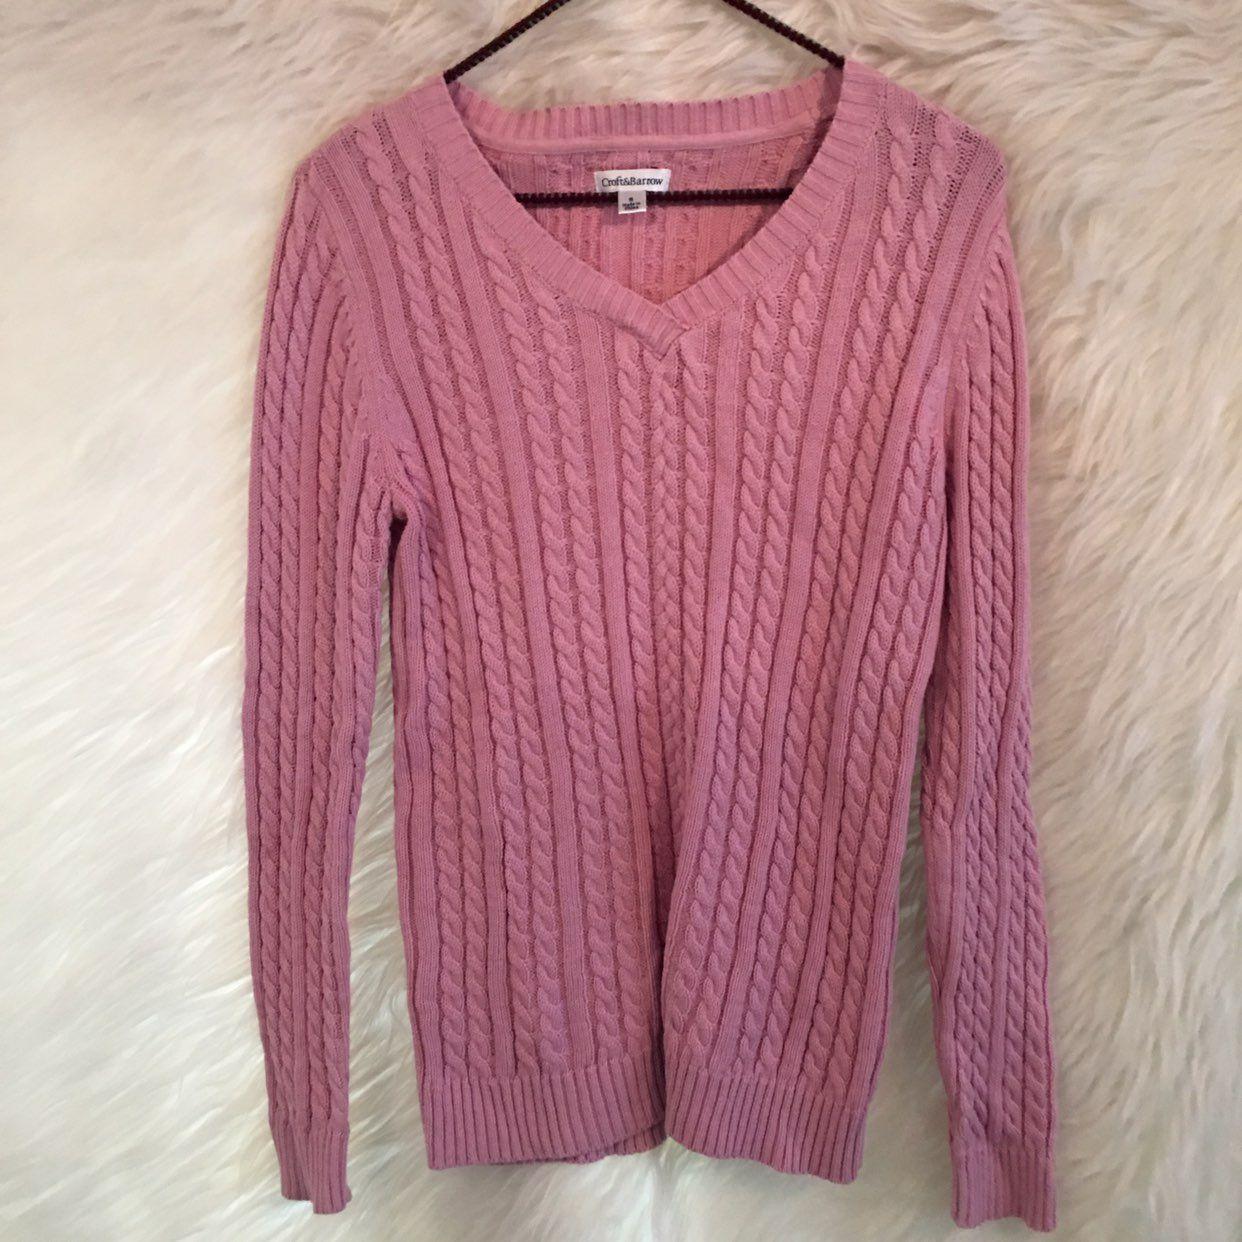 Pink Sweater - Croft Barrow - Small - Mercari: BUY & SELL THINGS ...